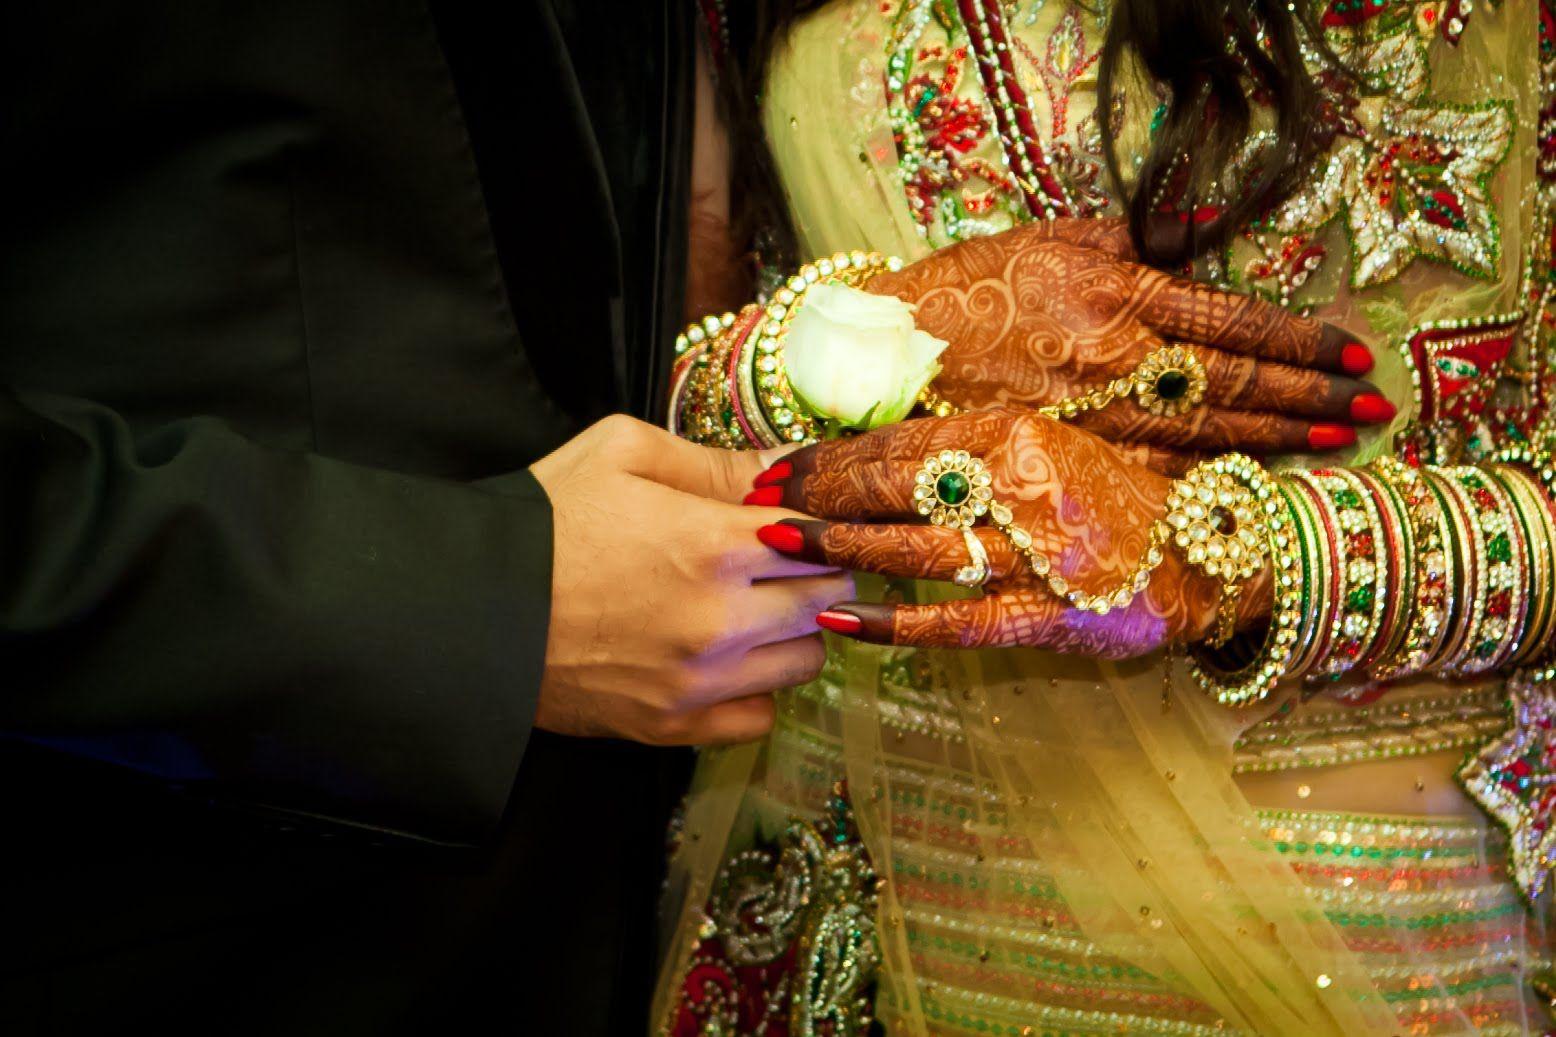 Mehndi Hands Couple : Marriage couple hands in mehndi india